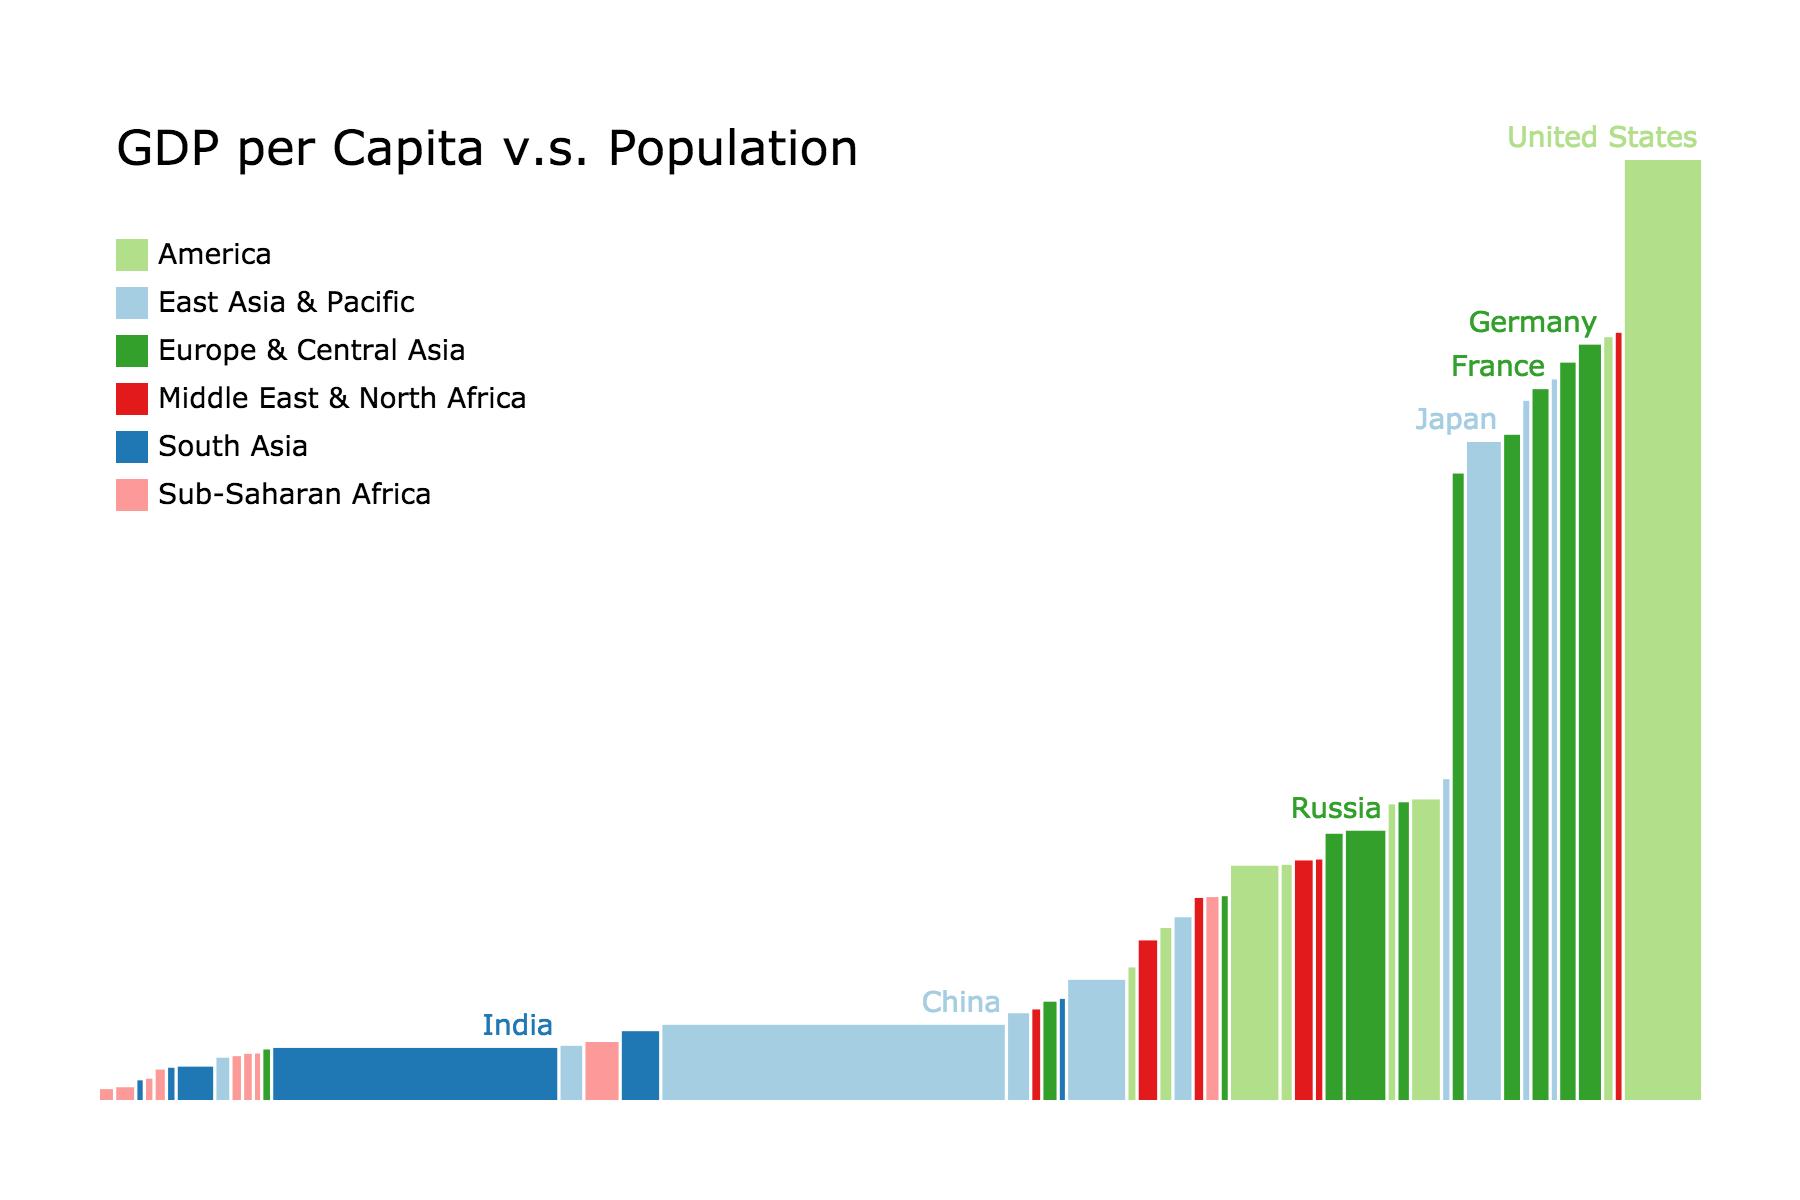 GDP per Capita v.s. Population